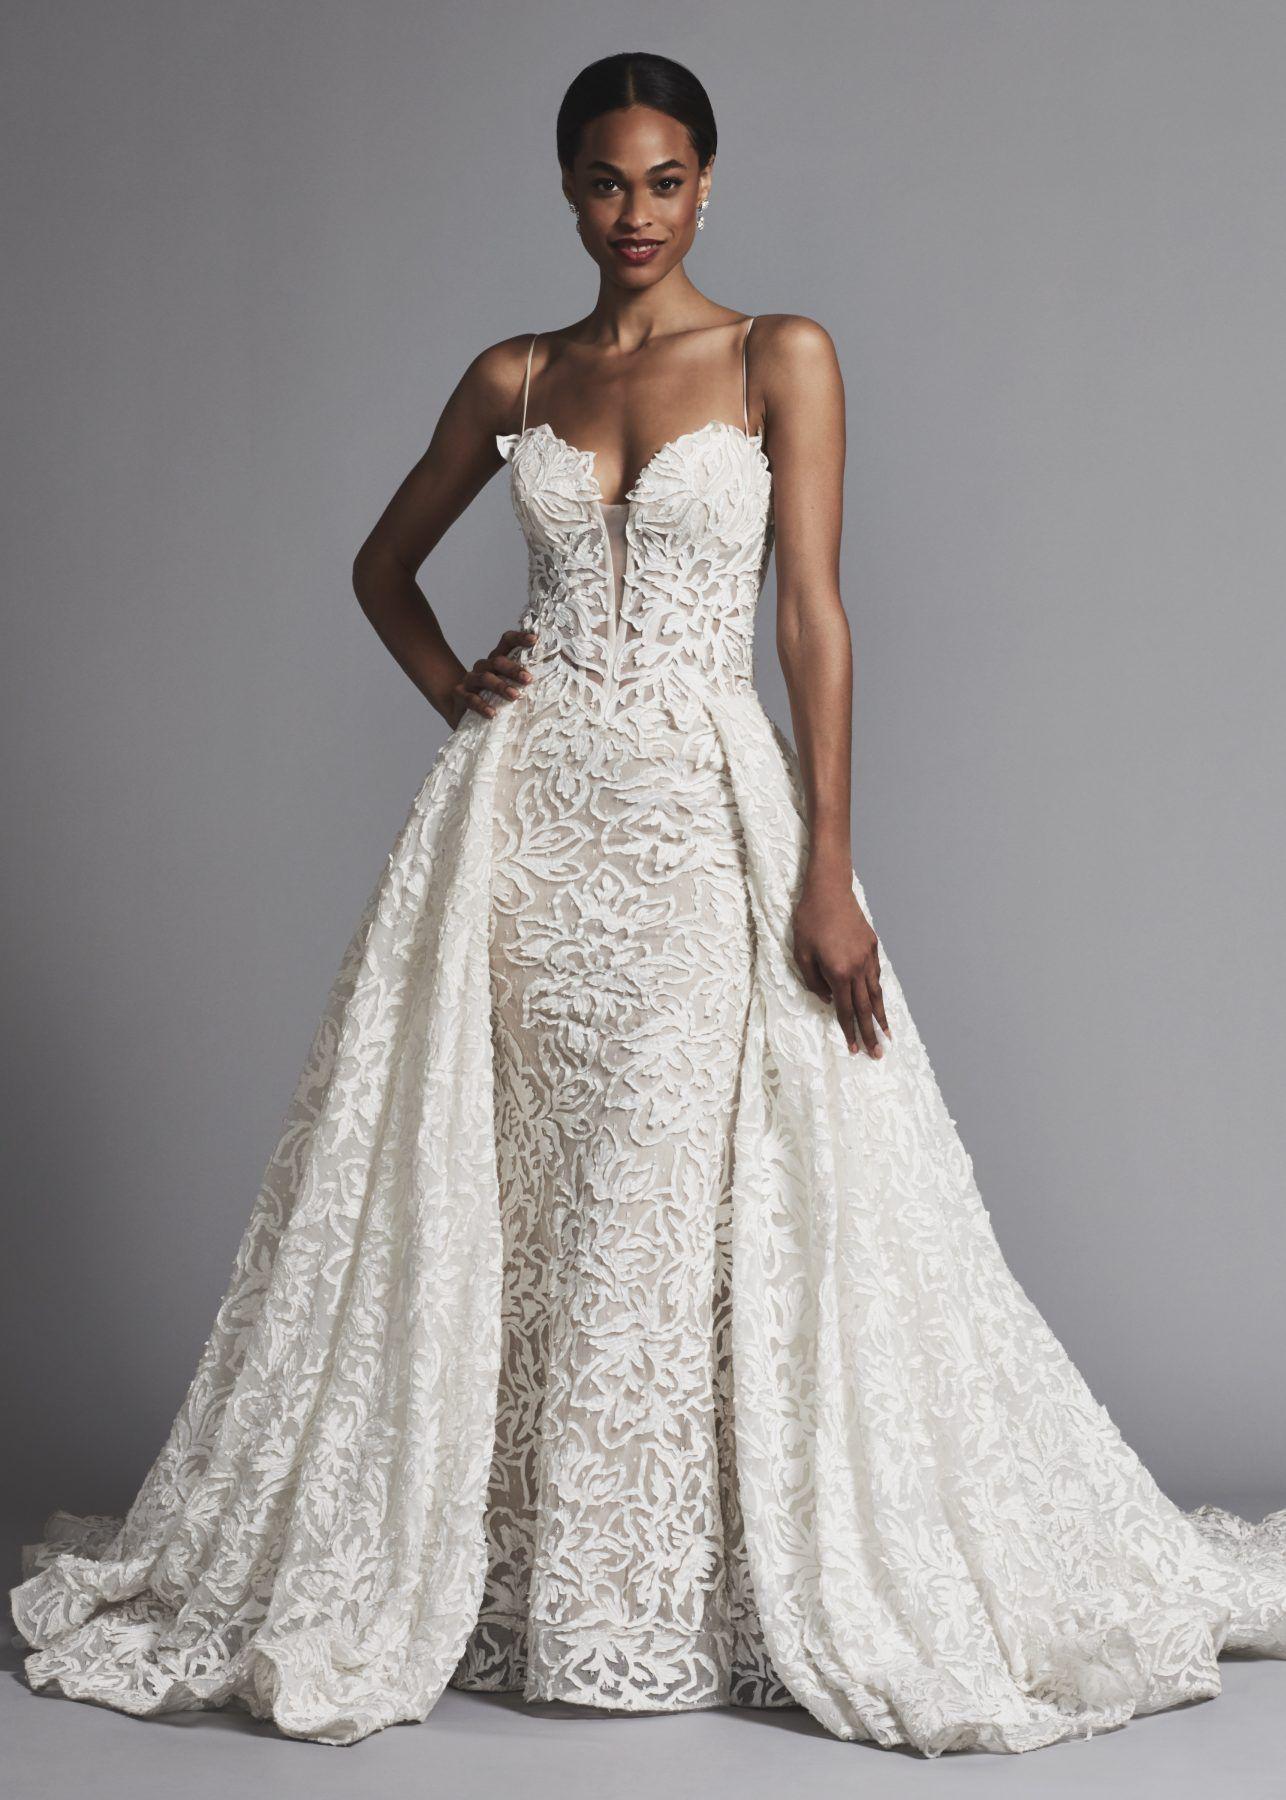 Lace Corset Bodice Sheath Wedding Dress With Lace Overskirt